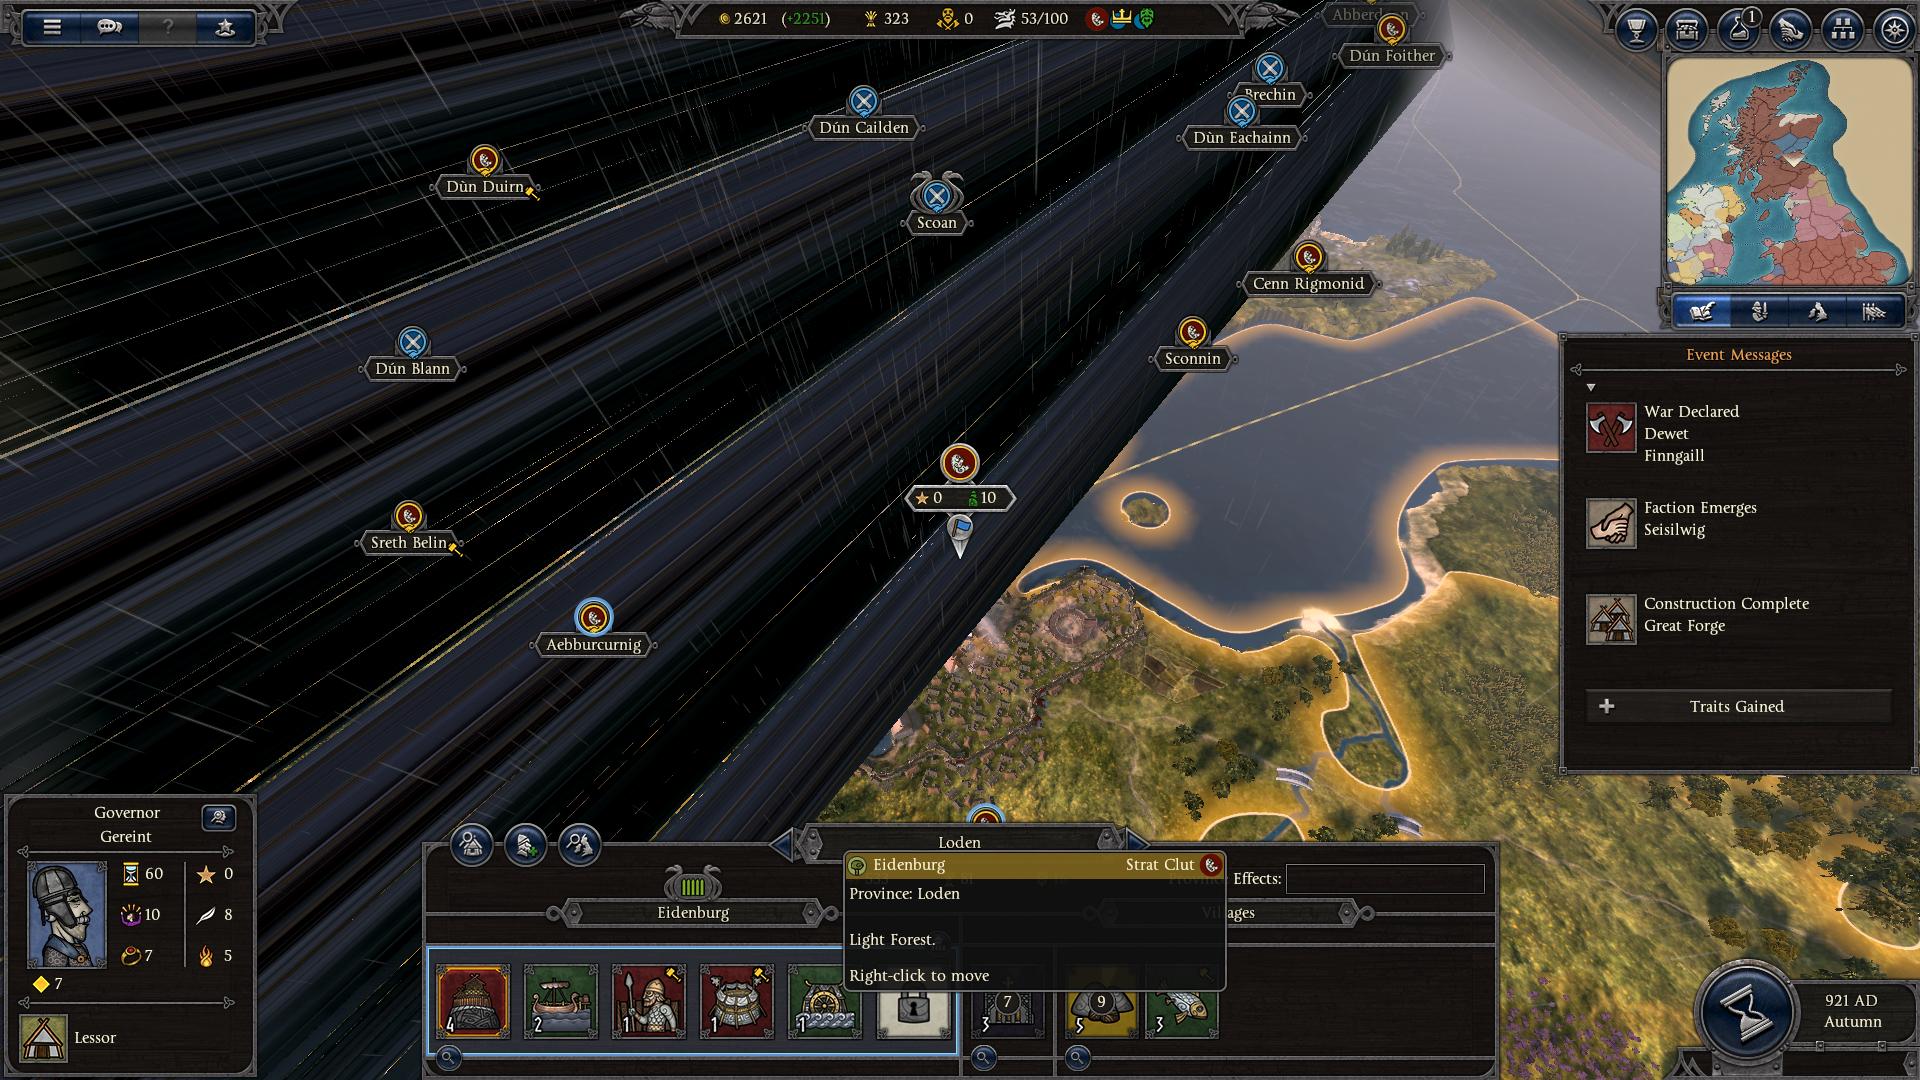 Post patch Campaign graphics problem — Total War Forums